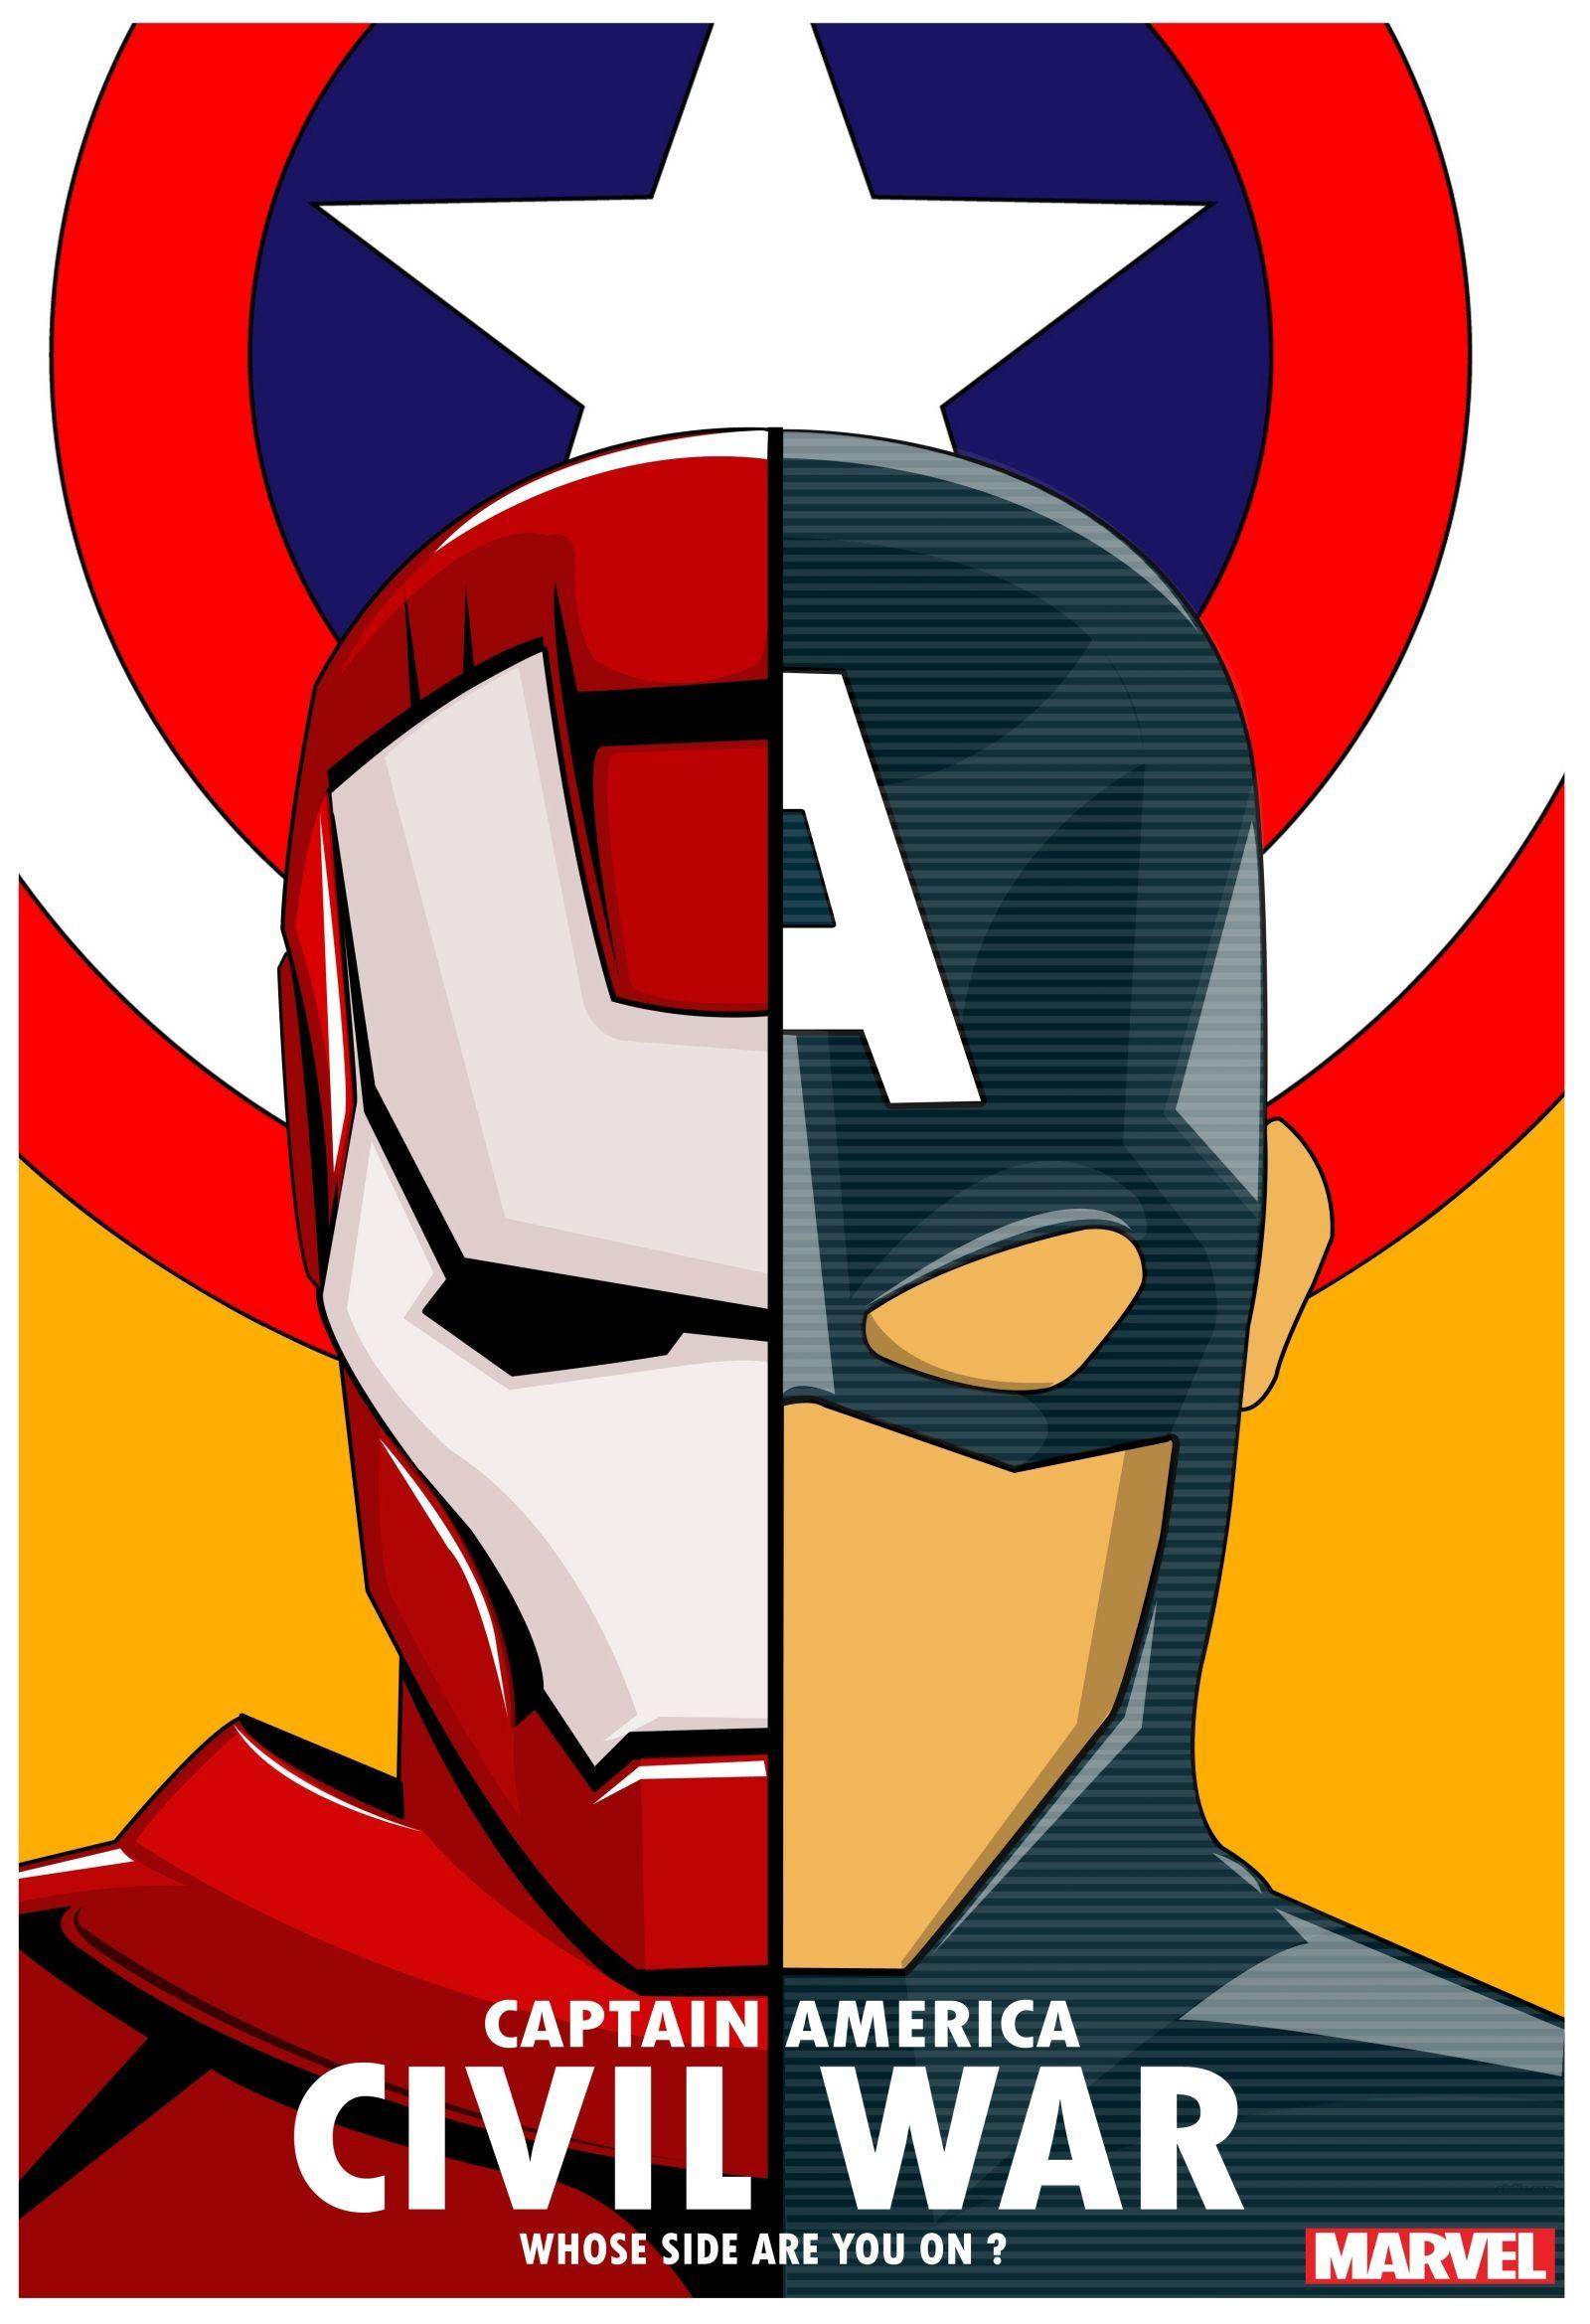 Civil War | Pinterest | Capitán américa, América y Cómics